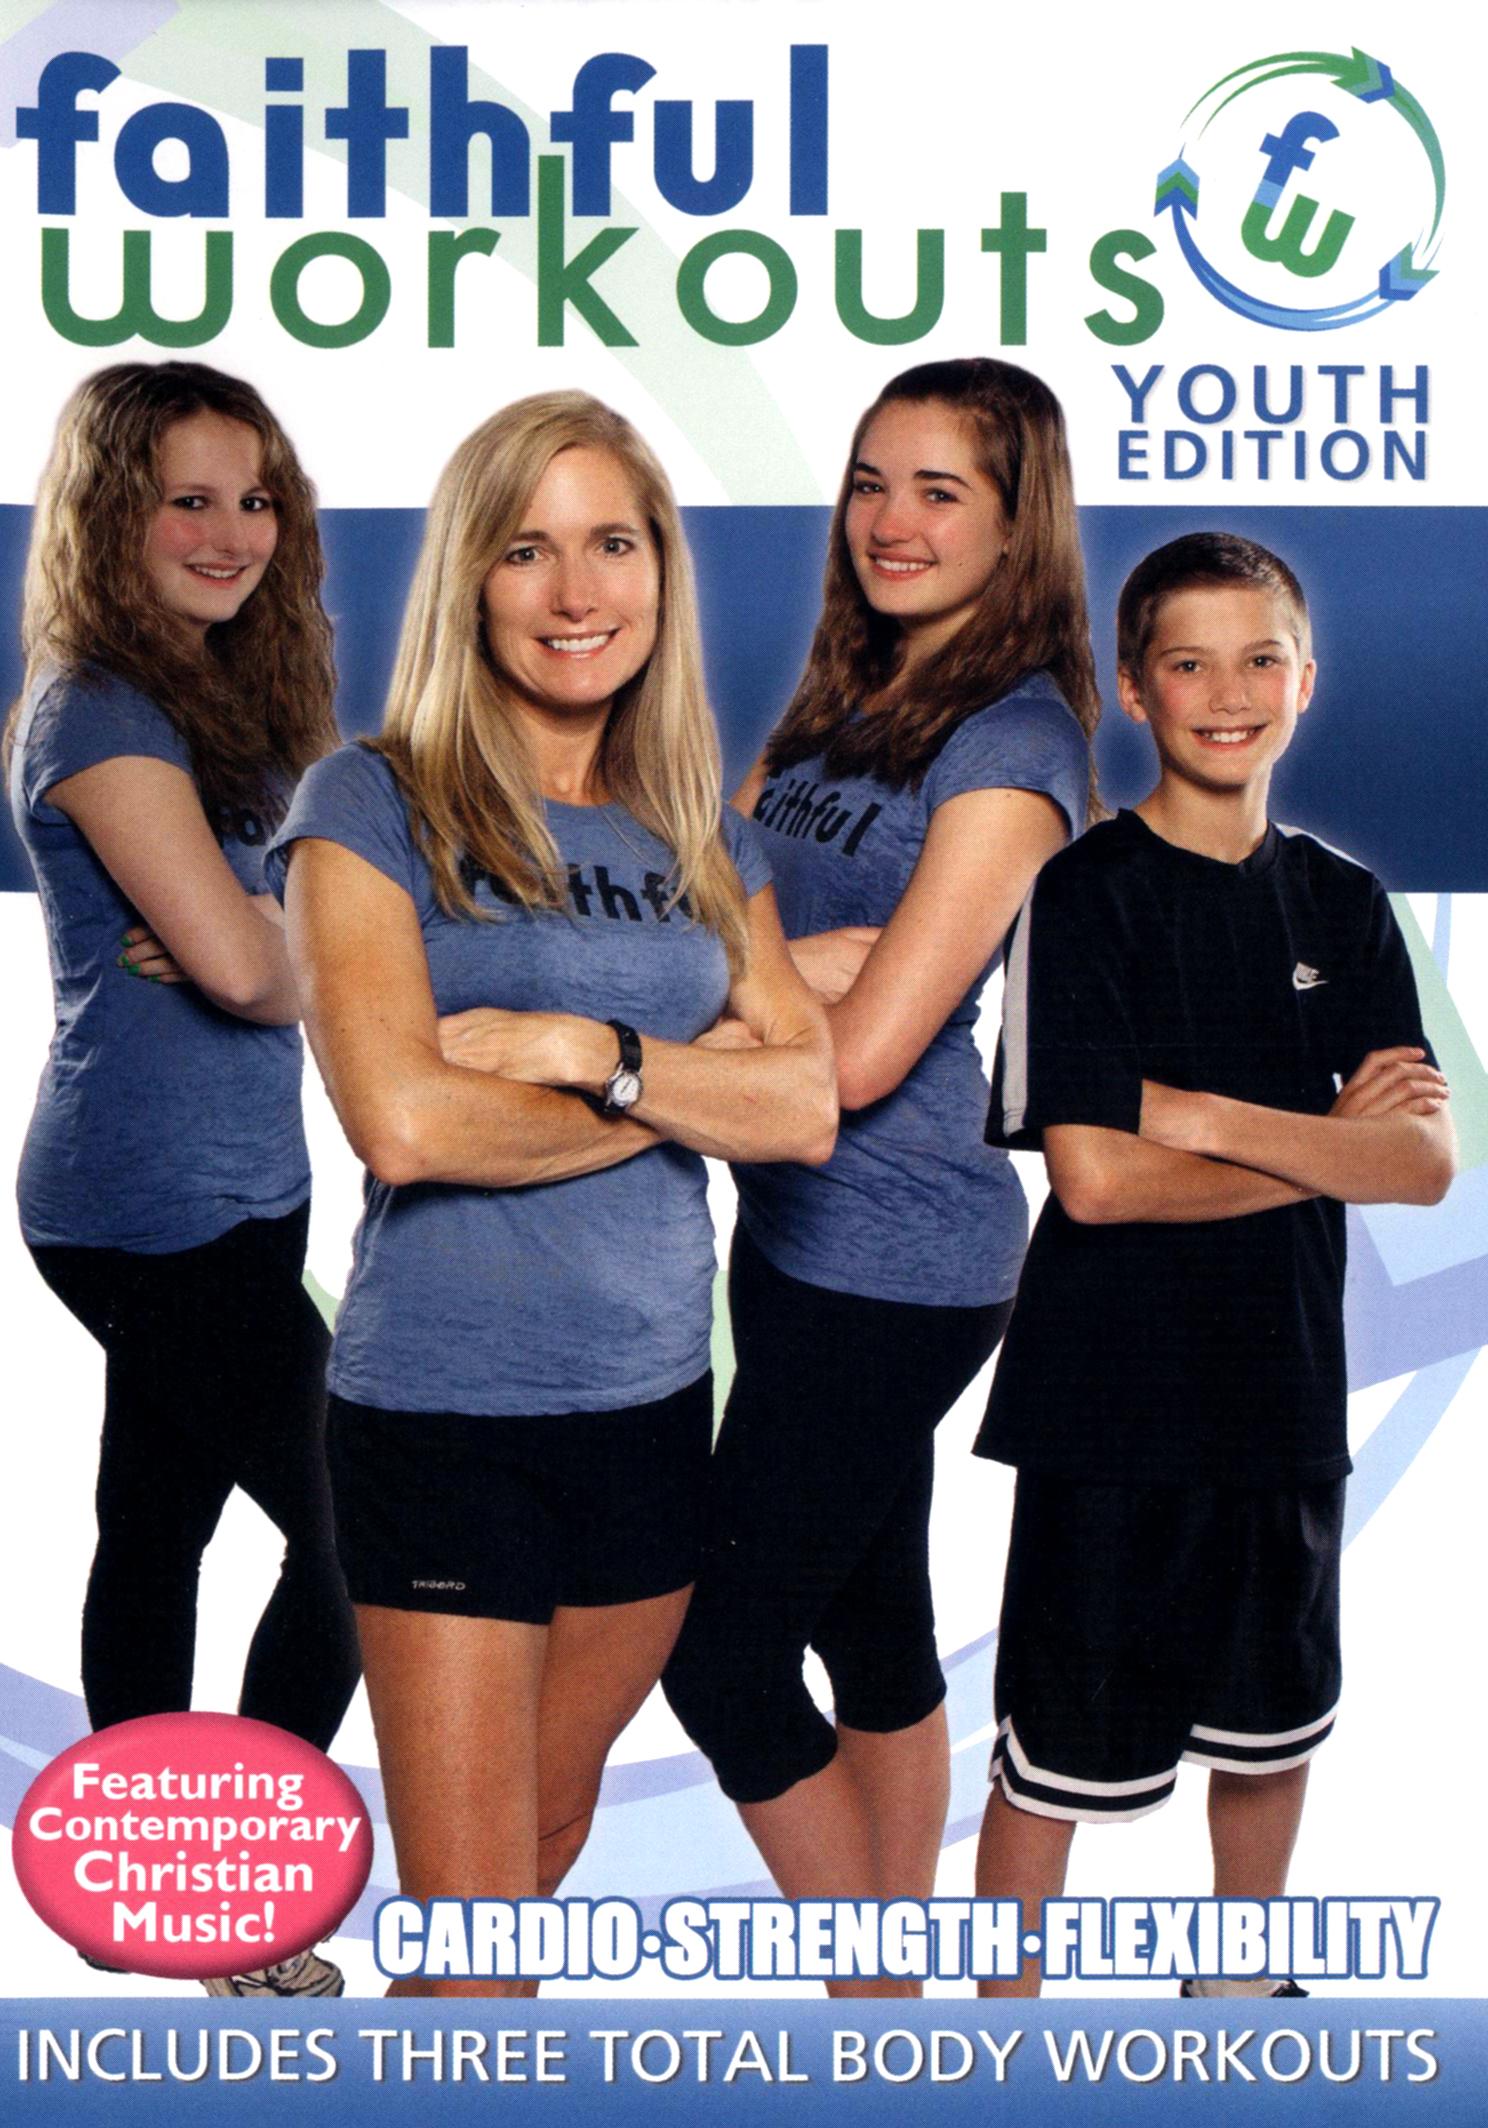 Faithful Workouts: Youth Edition - Cardio/Strength/Flexibility